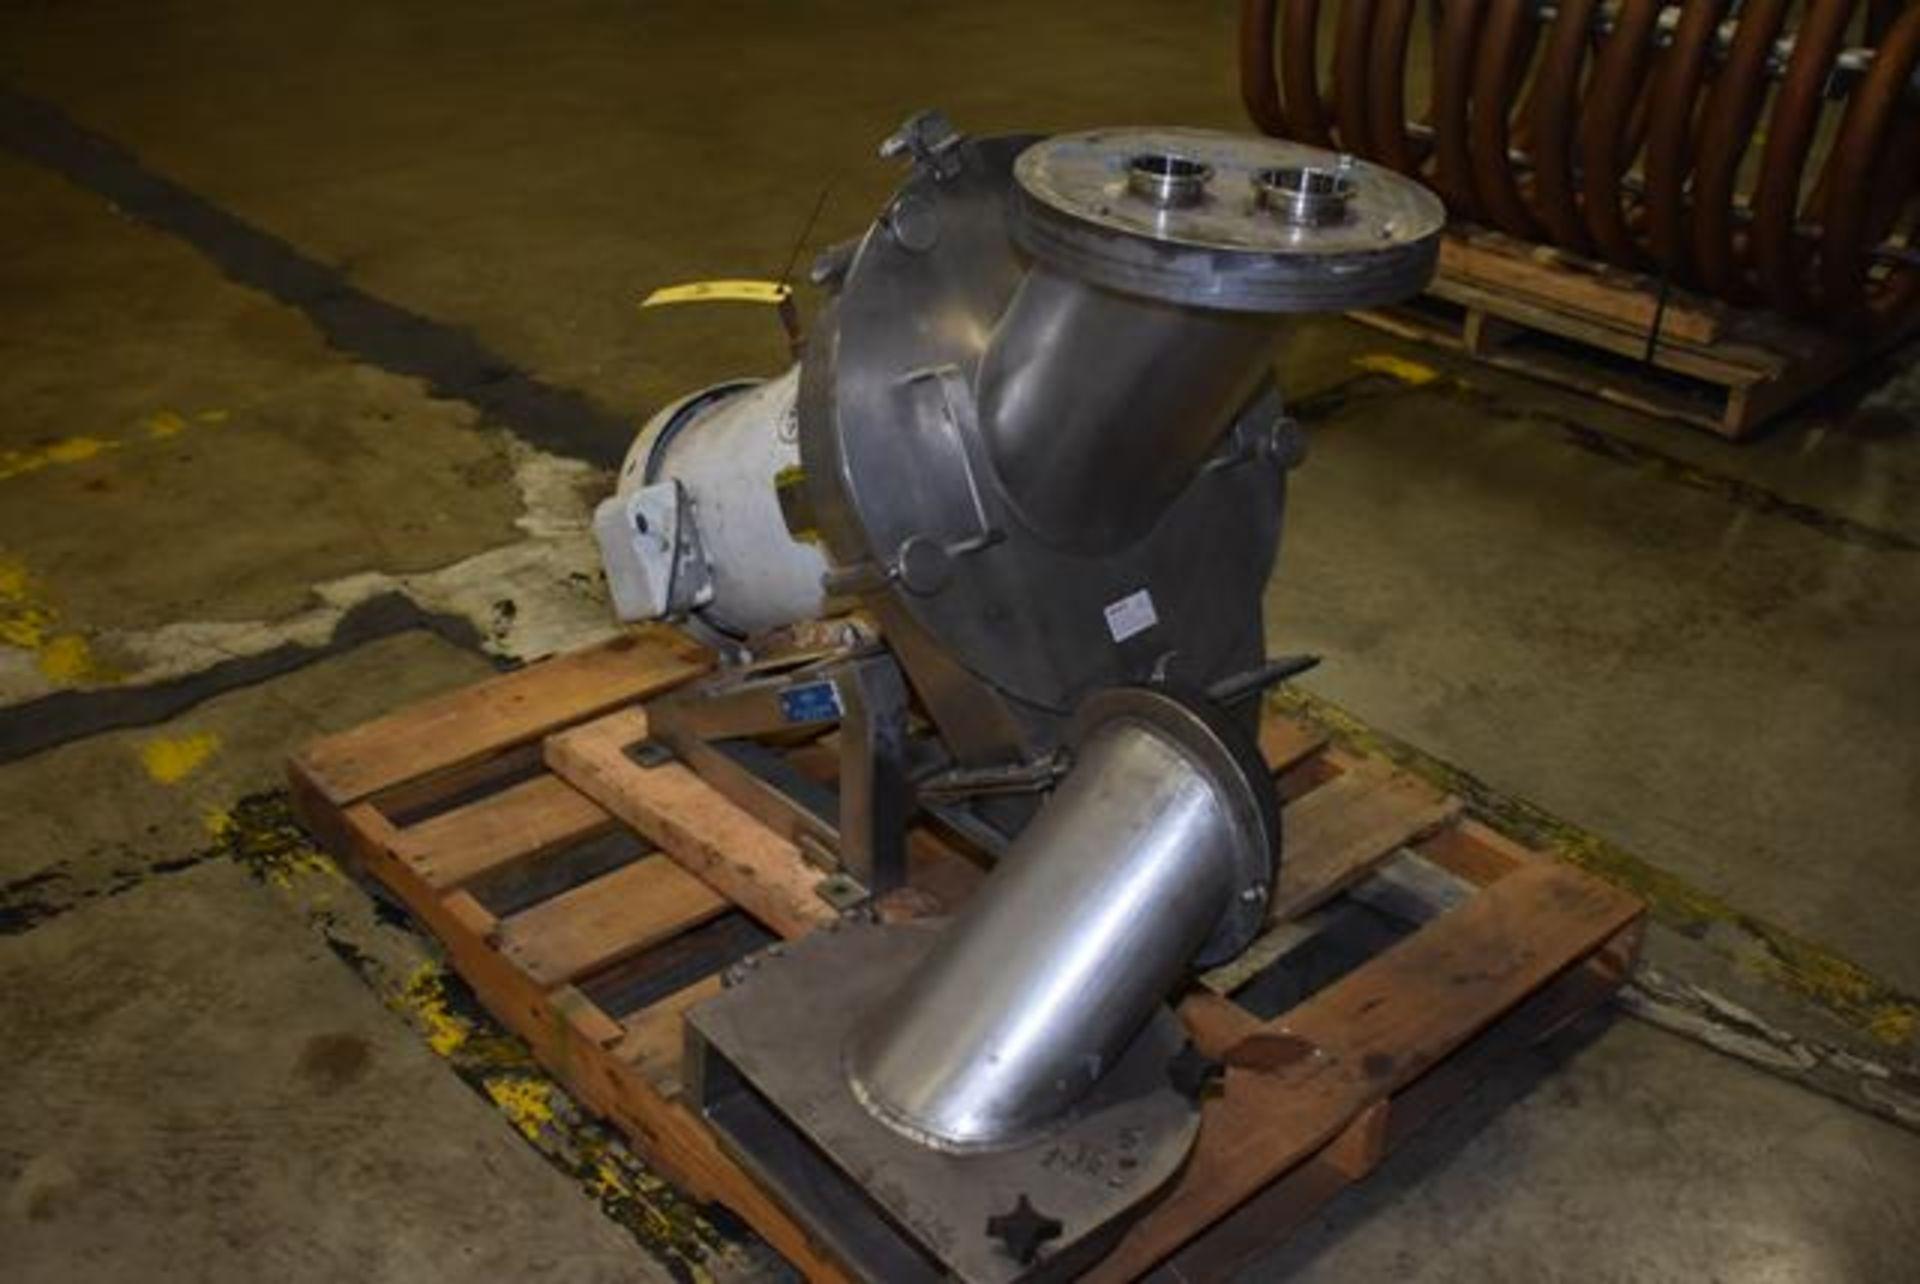 Lot 248 - Corenco Model M12A, S/N 1027 Disintegrator, 15 Hp Motor, Loading Fee: $50